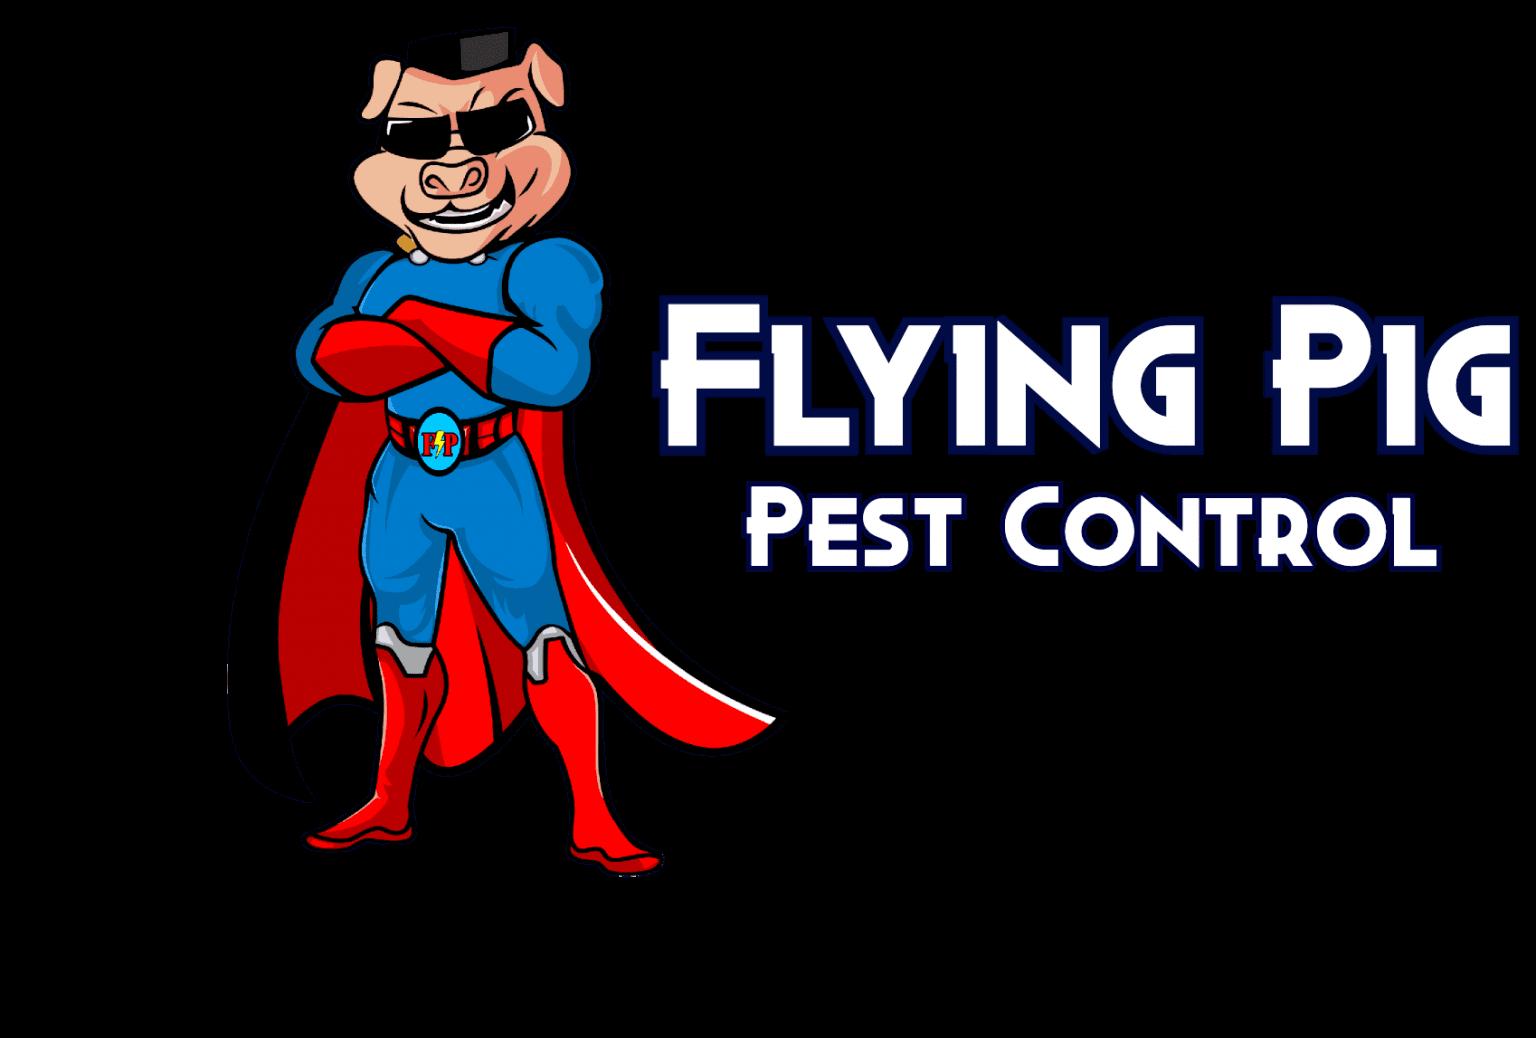 Flying Pig Pest Control